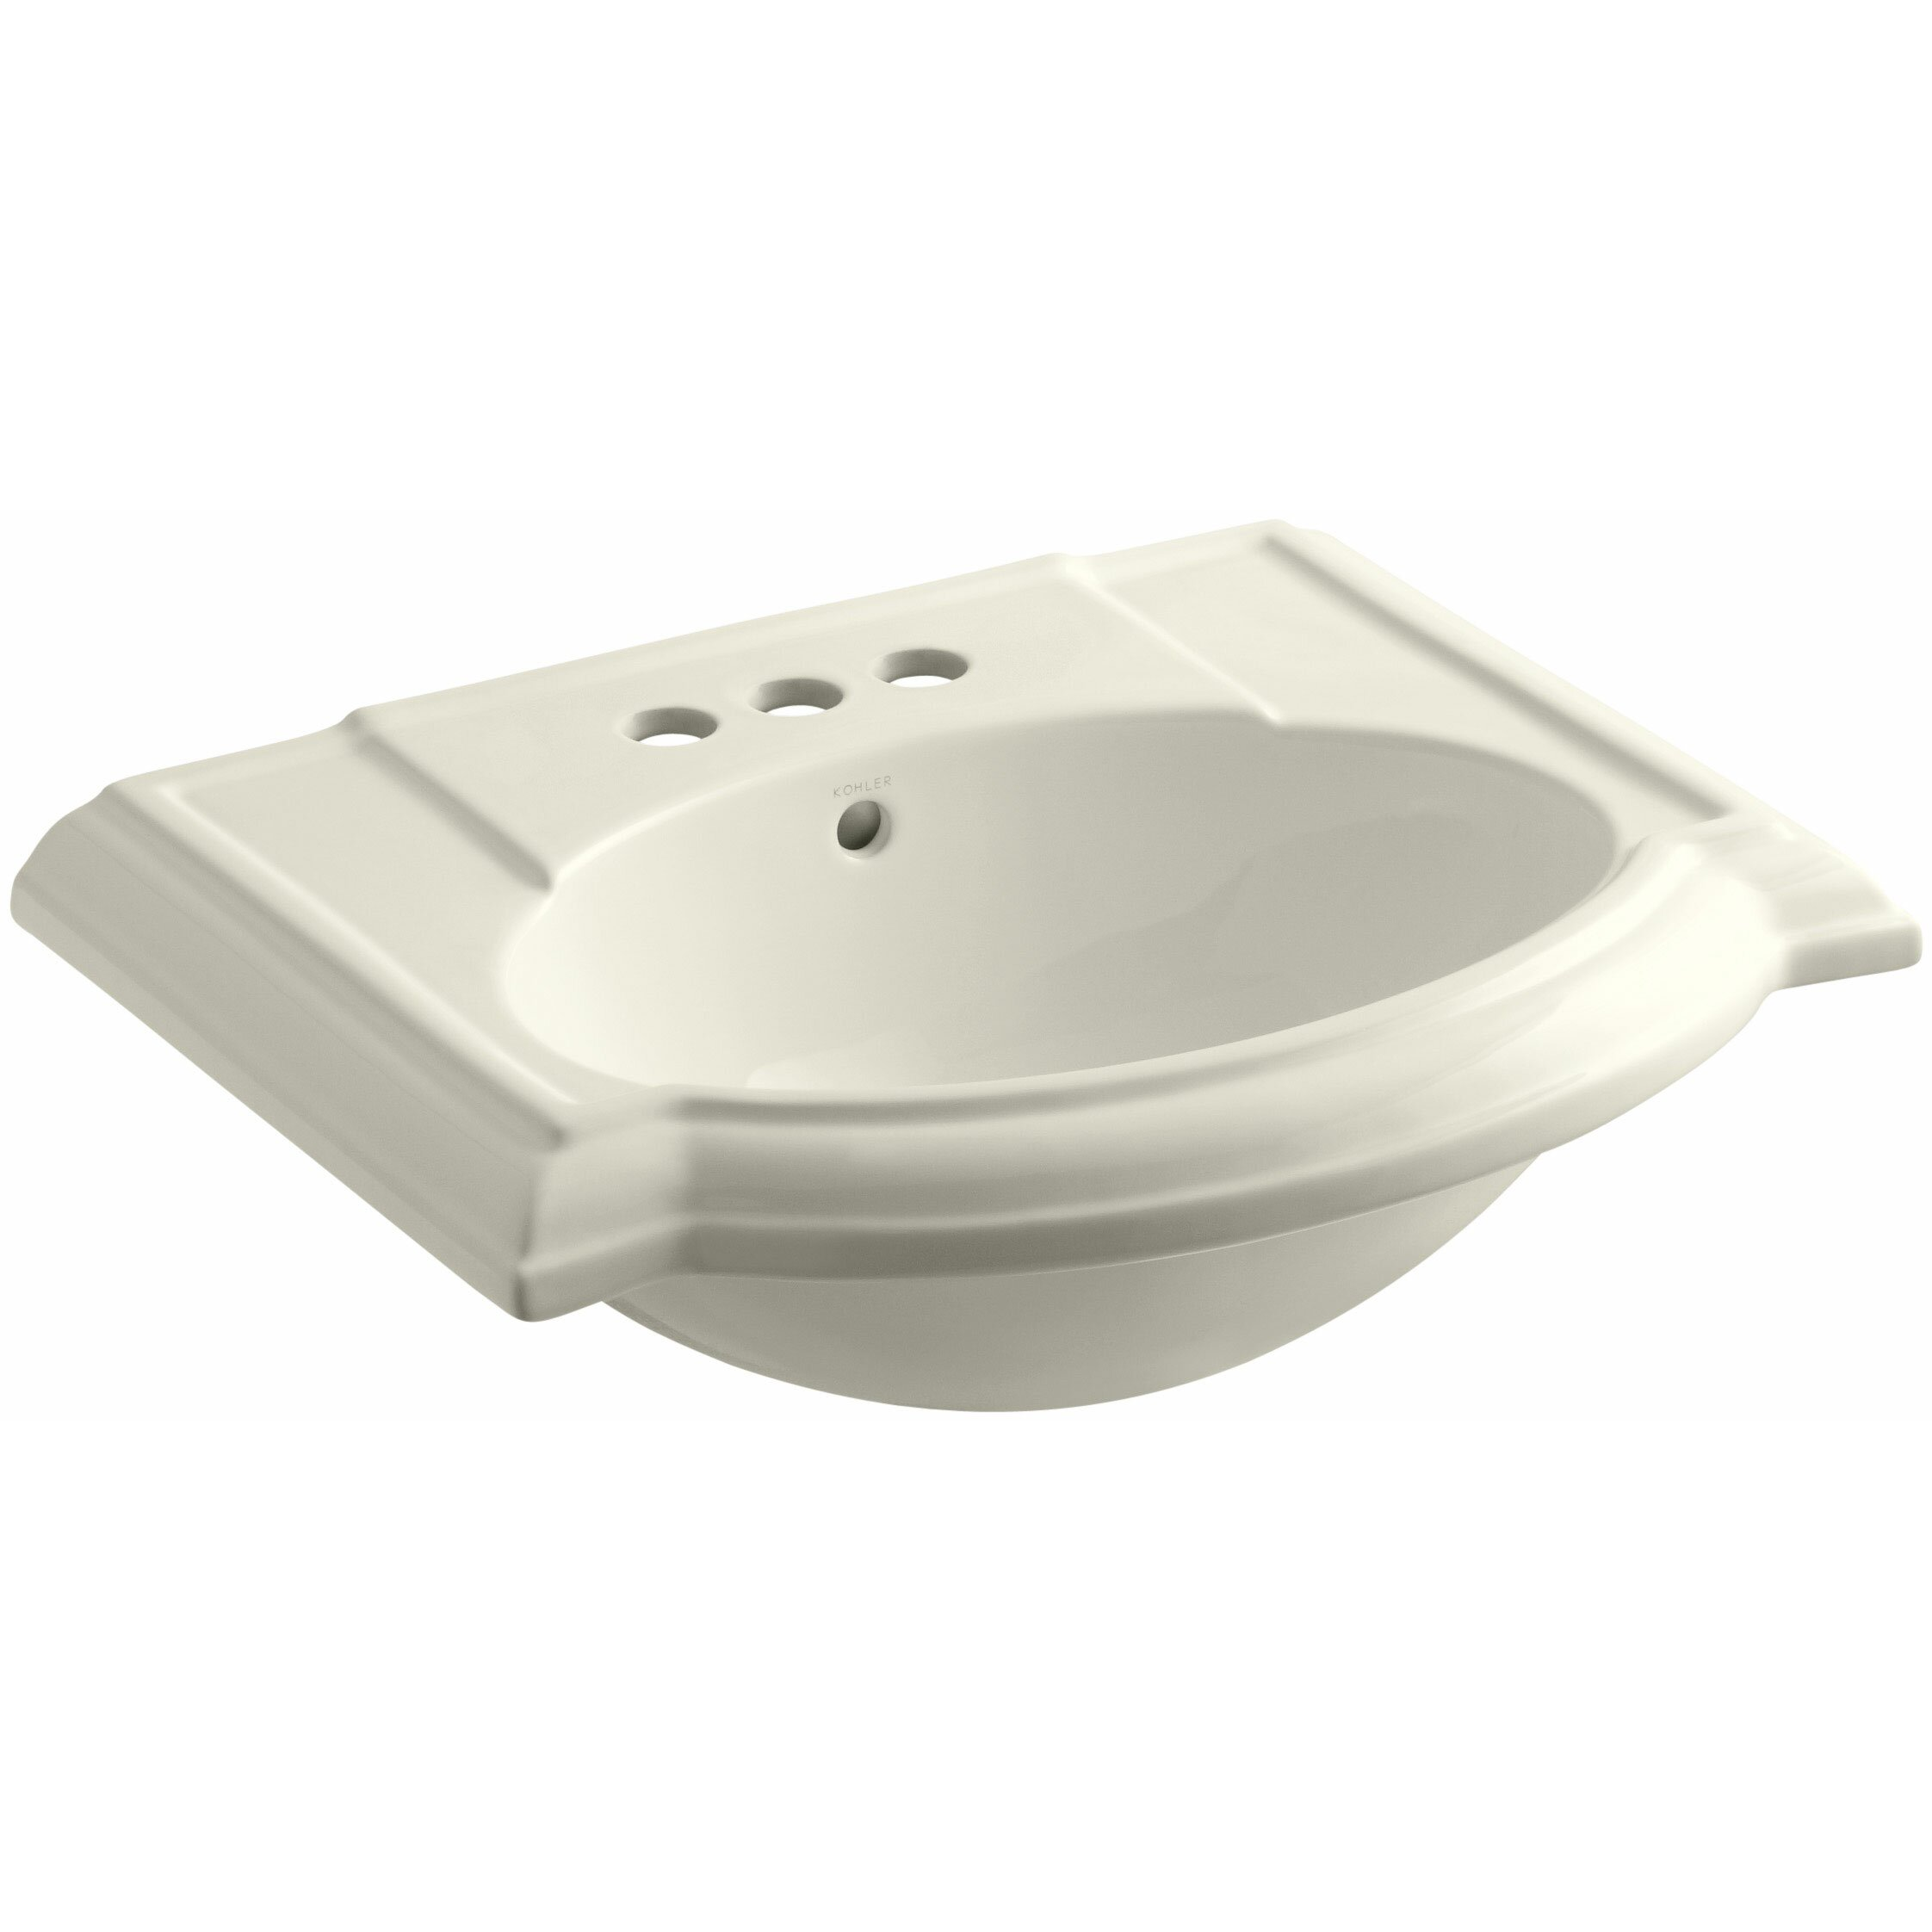 Kohler Devonshire Bathroom Sink With 4 Centerset Faucet Holes Reviews